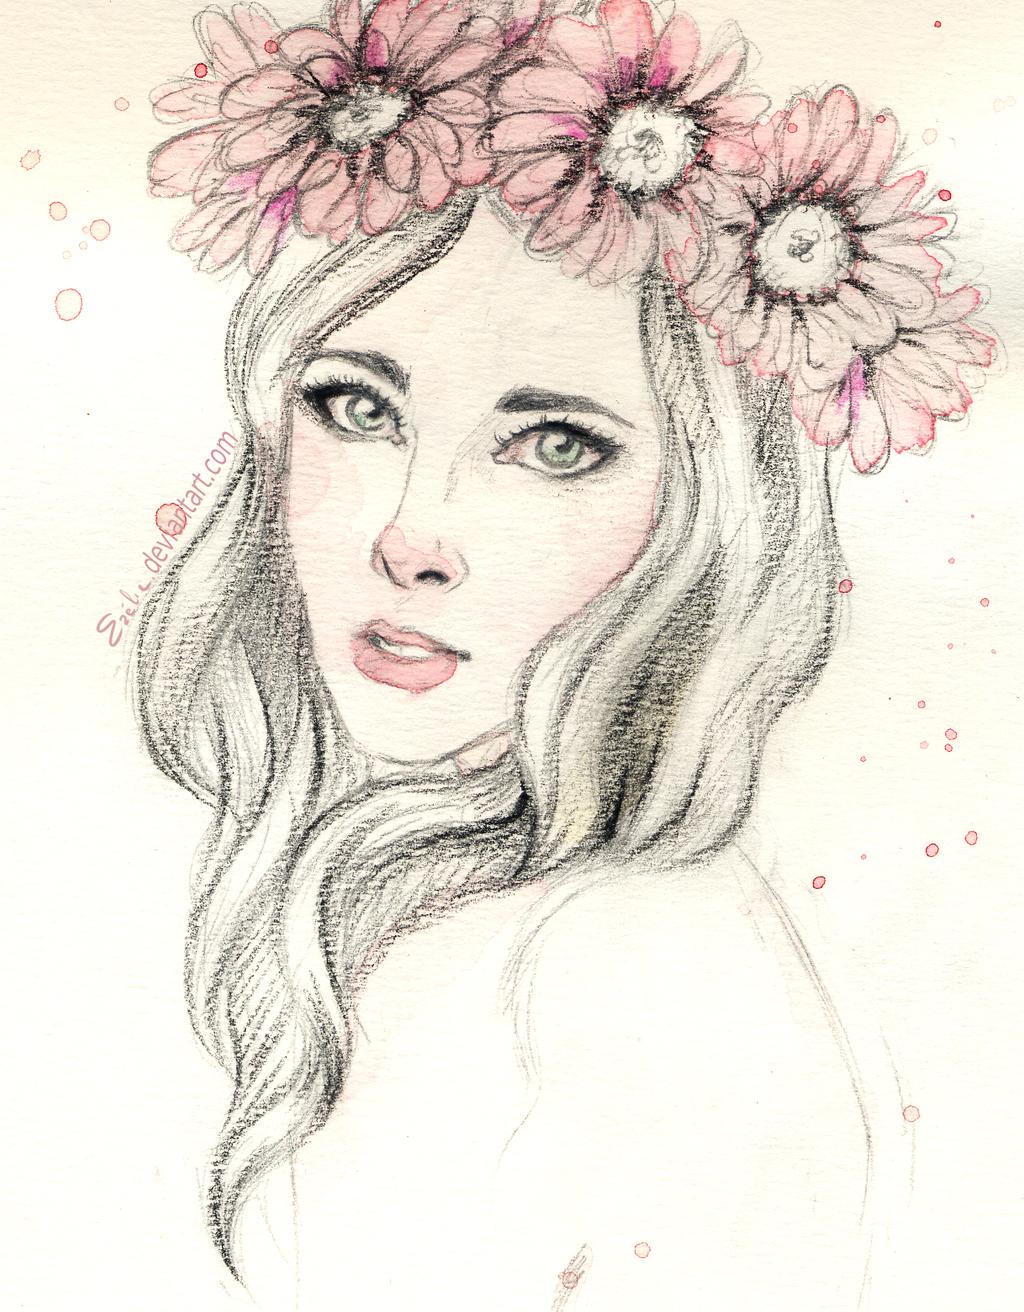 Pink flowers by Ezelie on DeviantArt